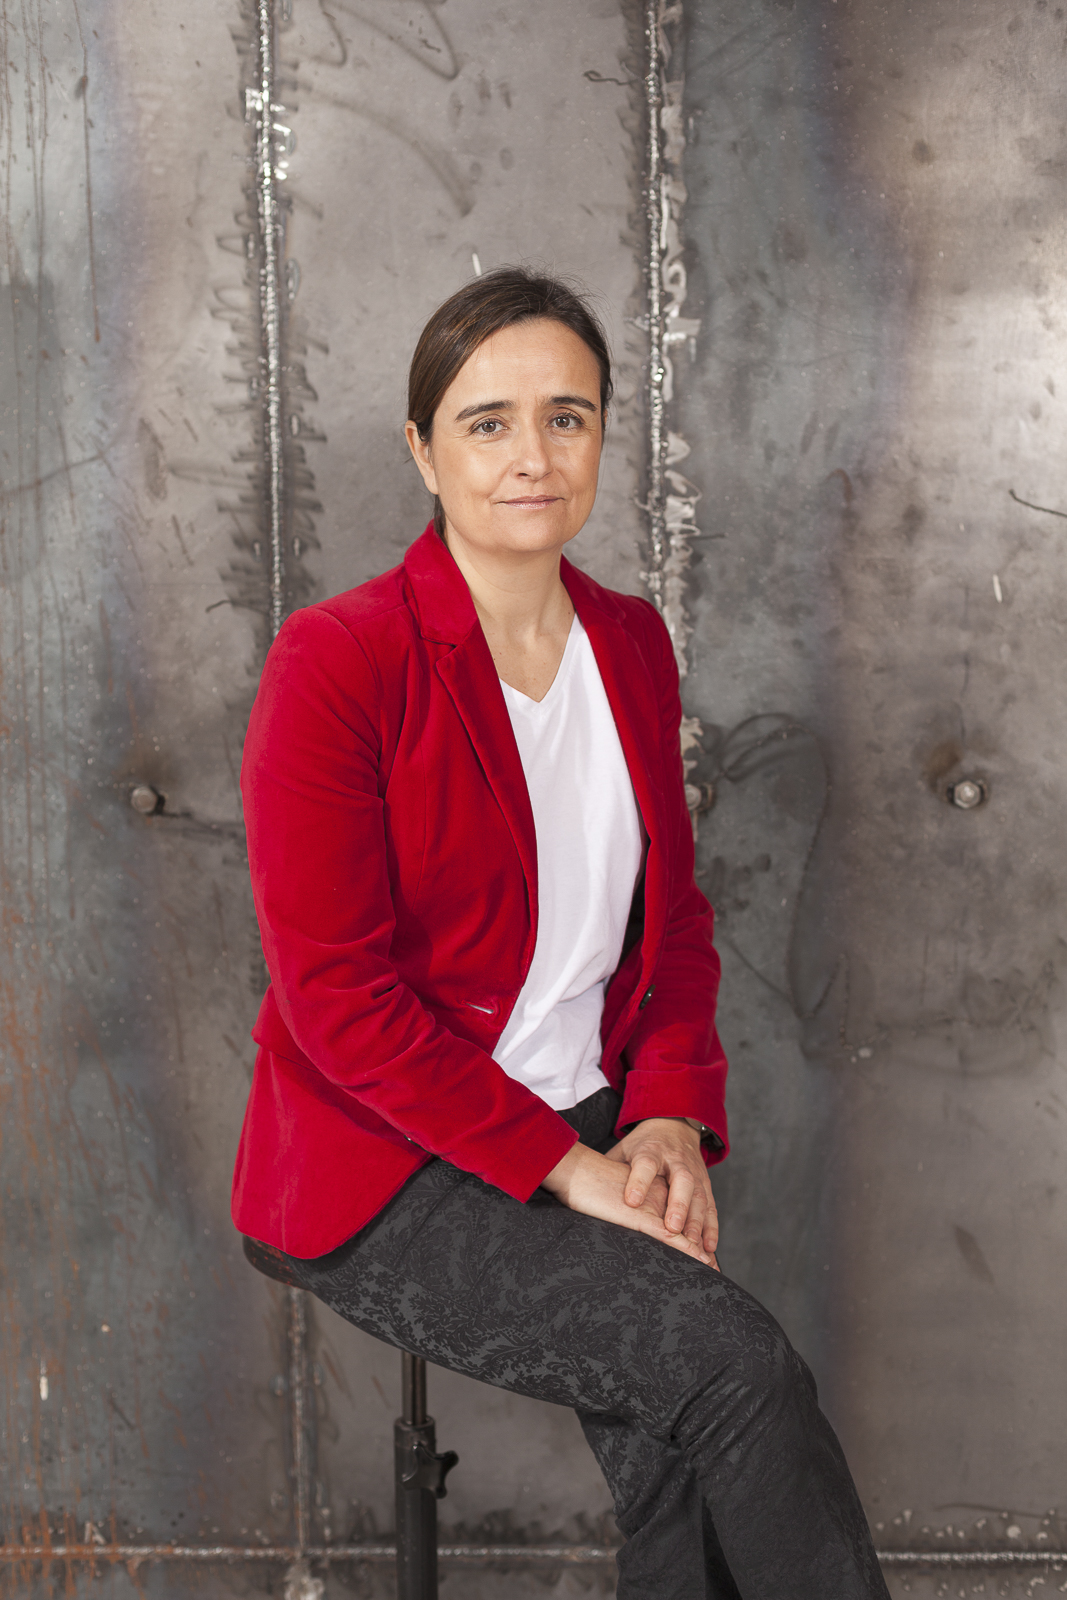 NataliaGrech